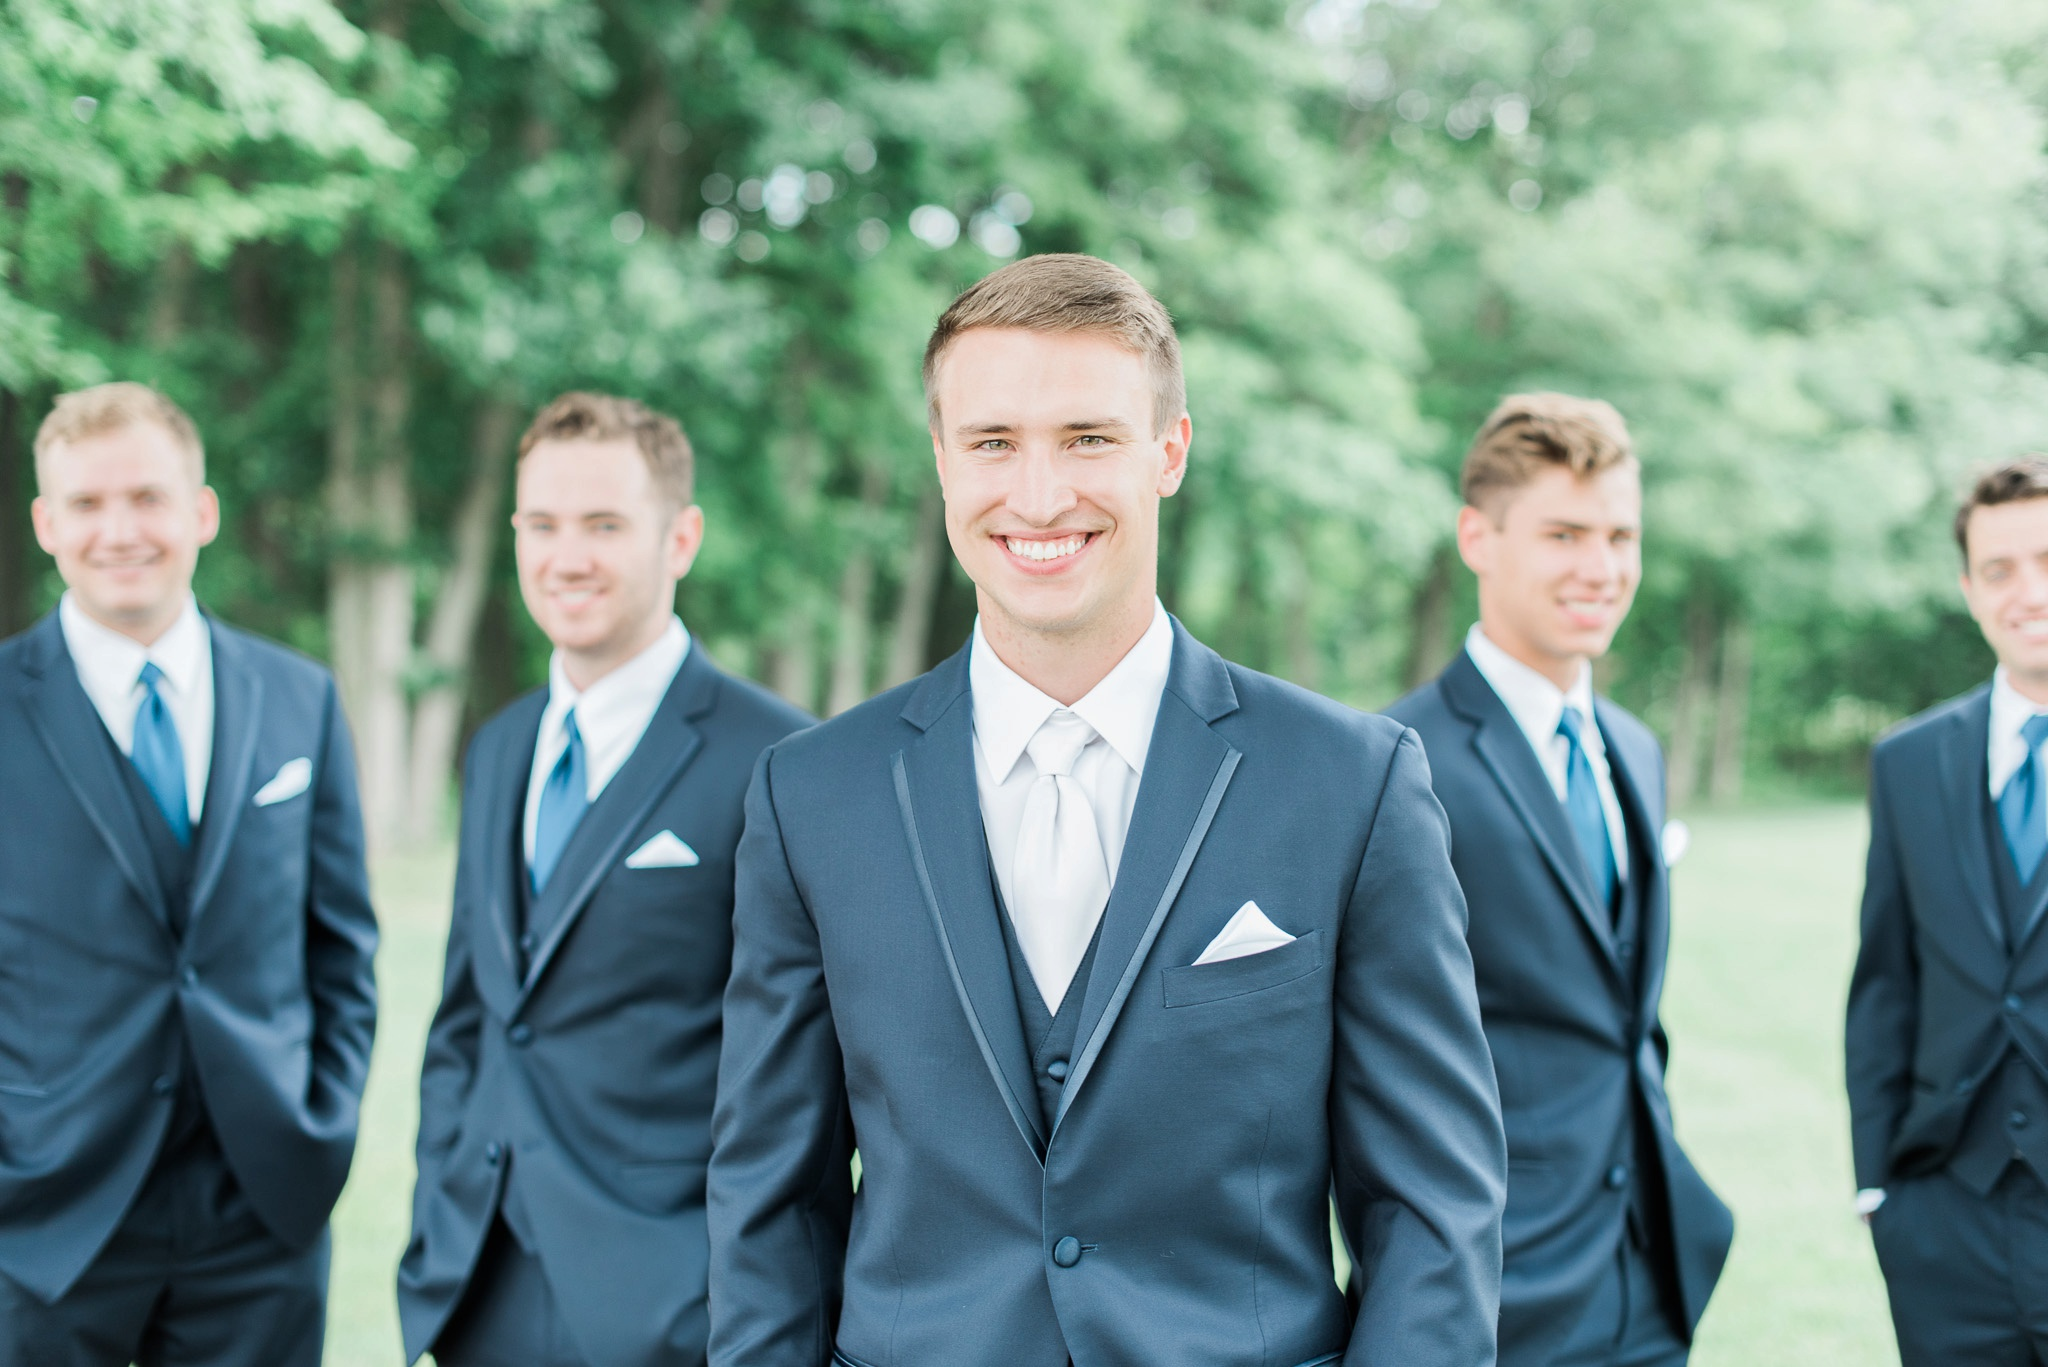 sunbury-ohio-wedding-hannah-johnathan_0046.jpg